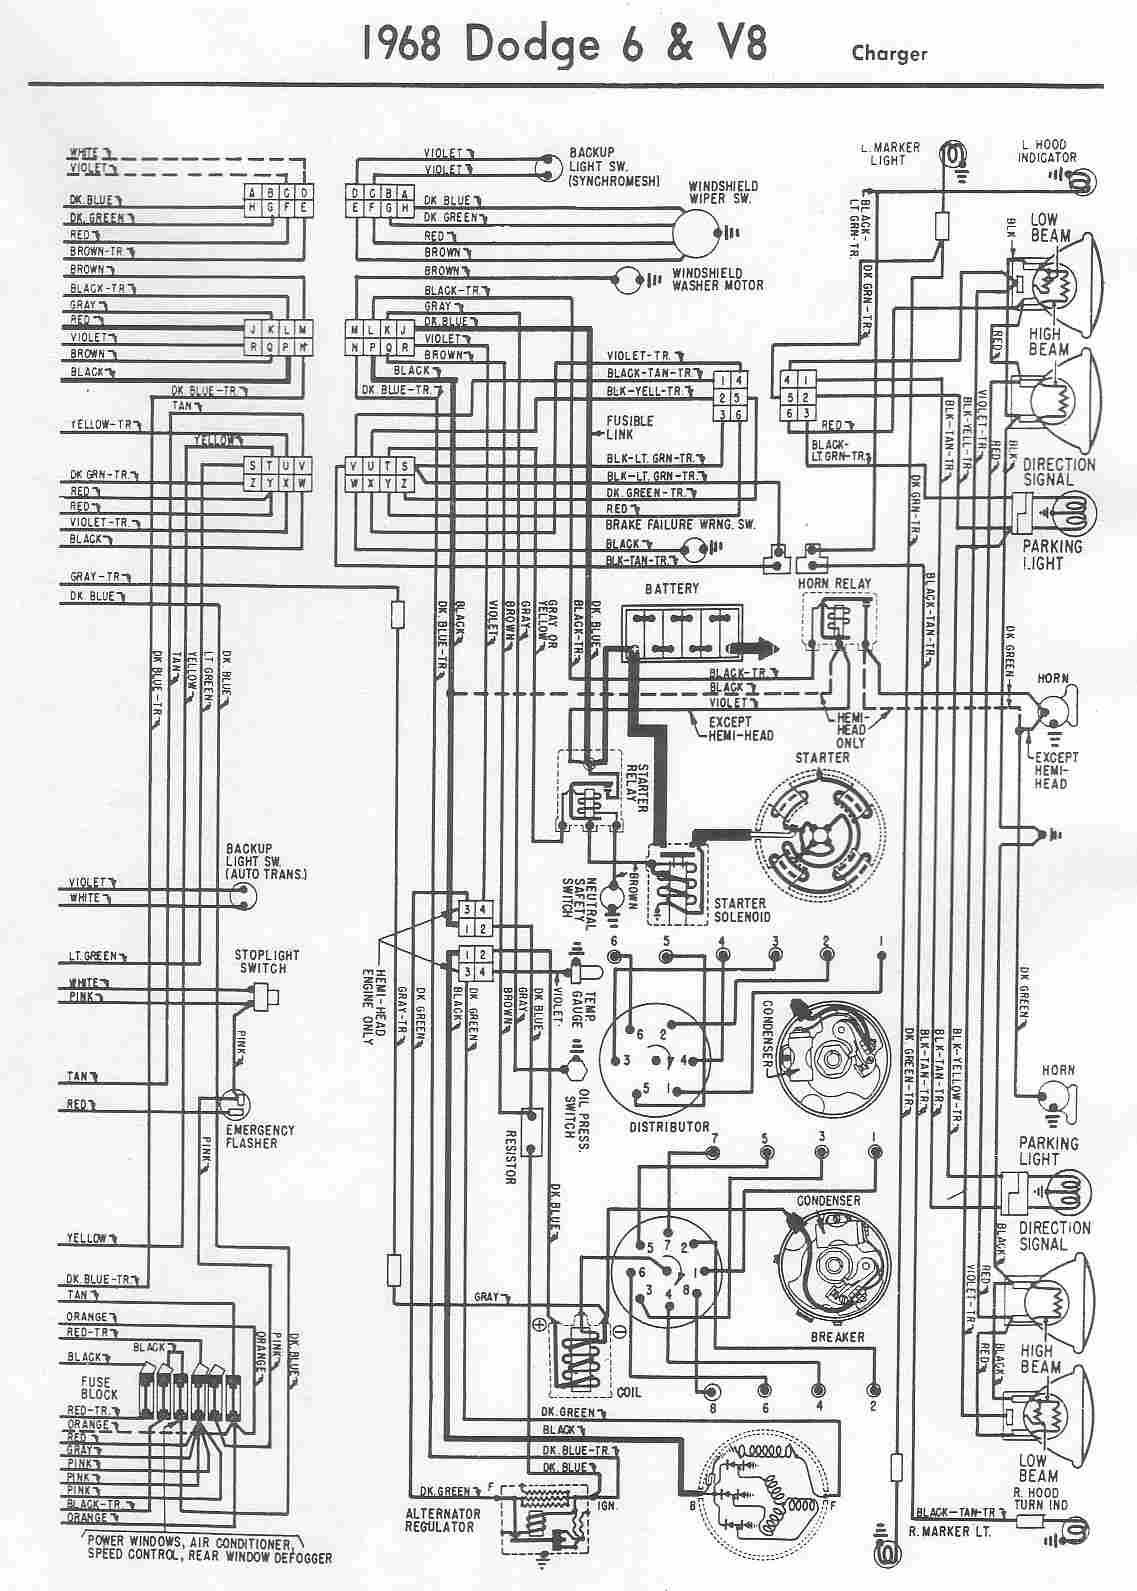 68 ford galaxie wiring diagram wiring library vw wiring diagrams free downloads 1969 ford galaxie 500 [ 1137 x 1591 Pixel ]